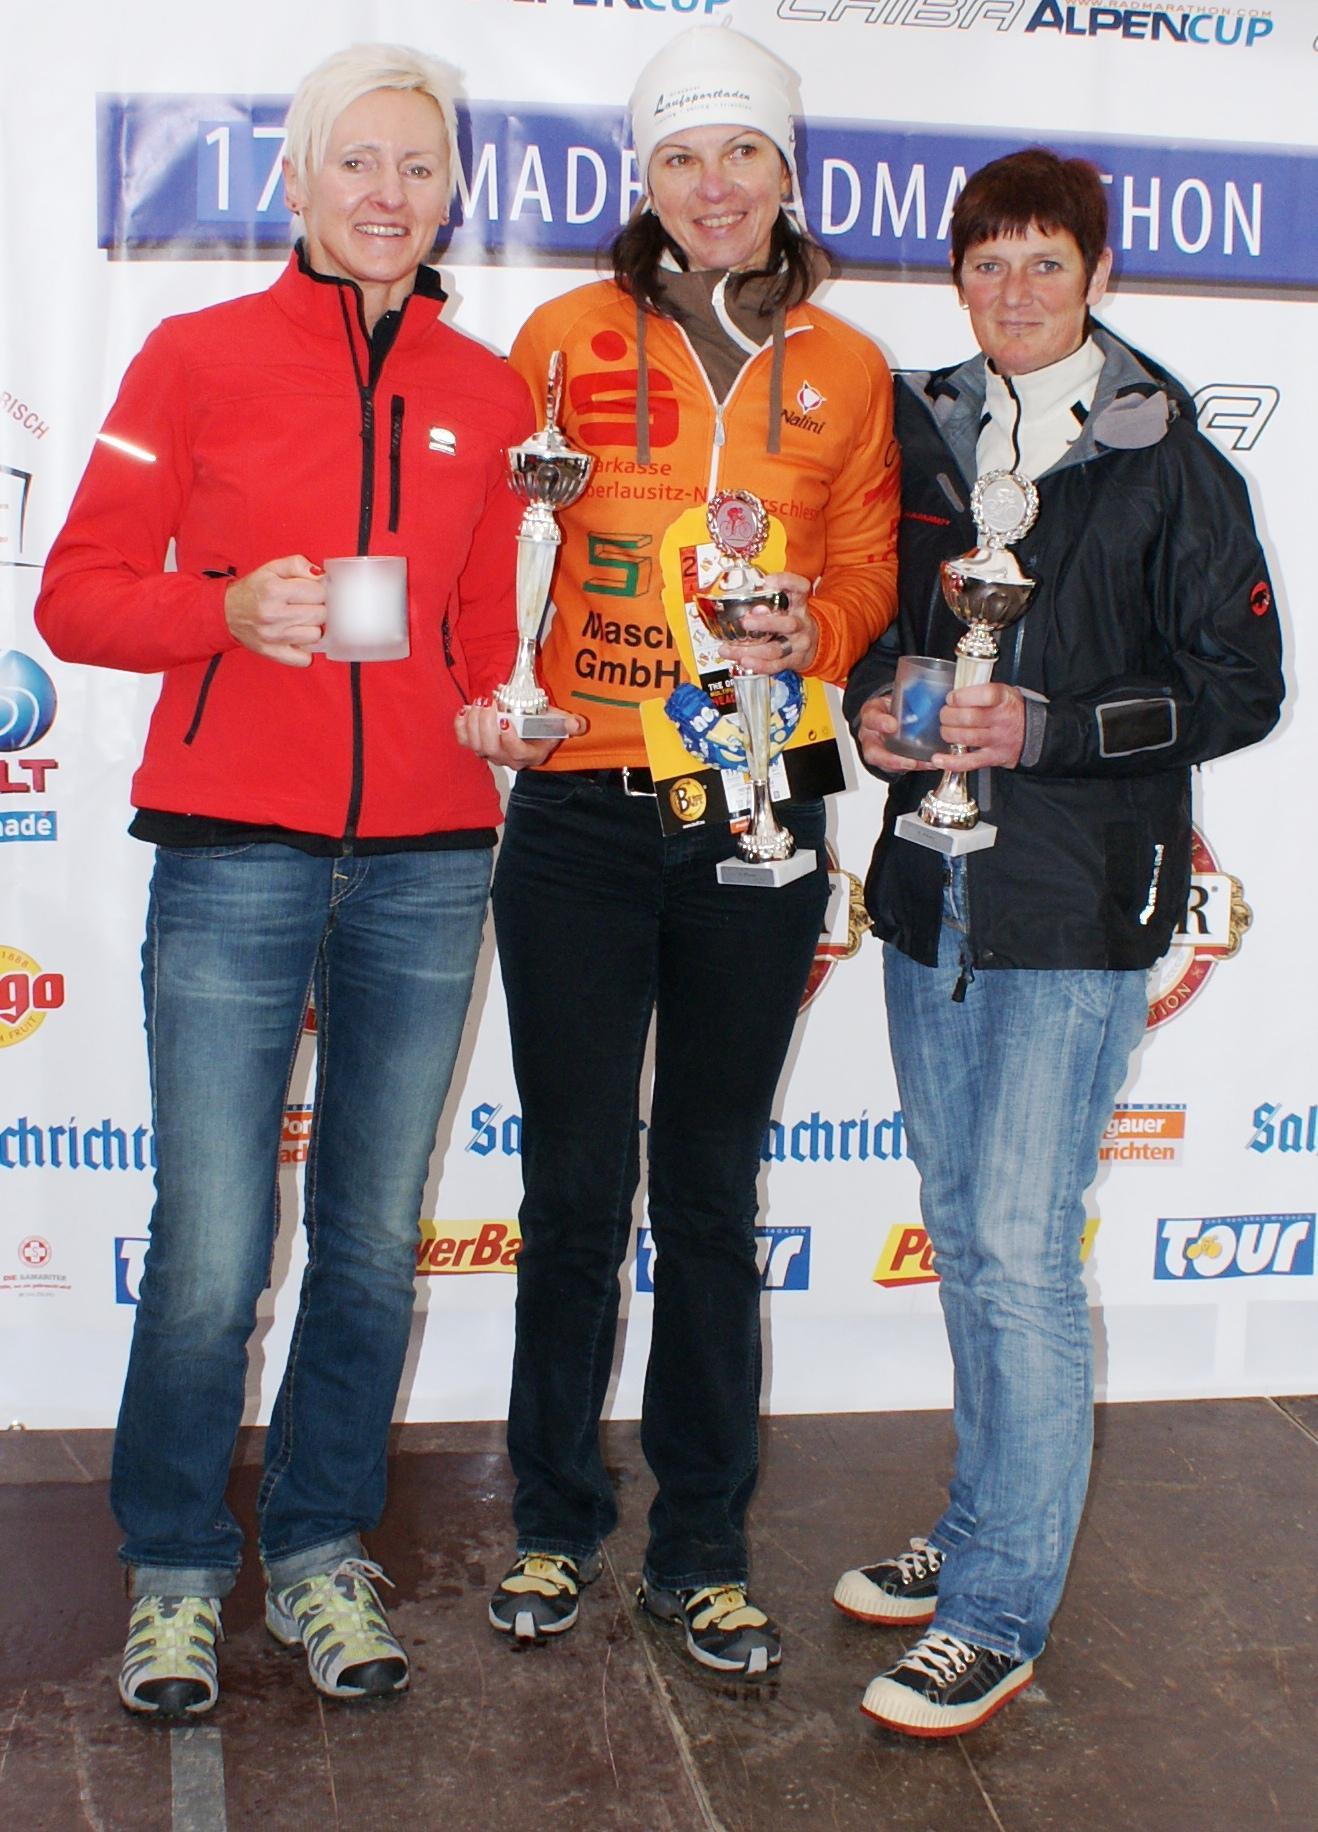 17. Amade Radmarathon